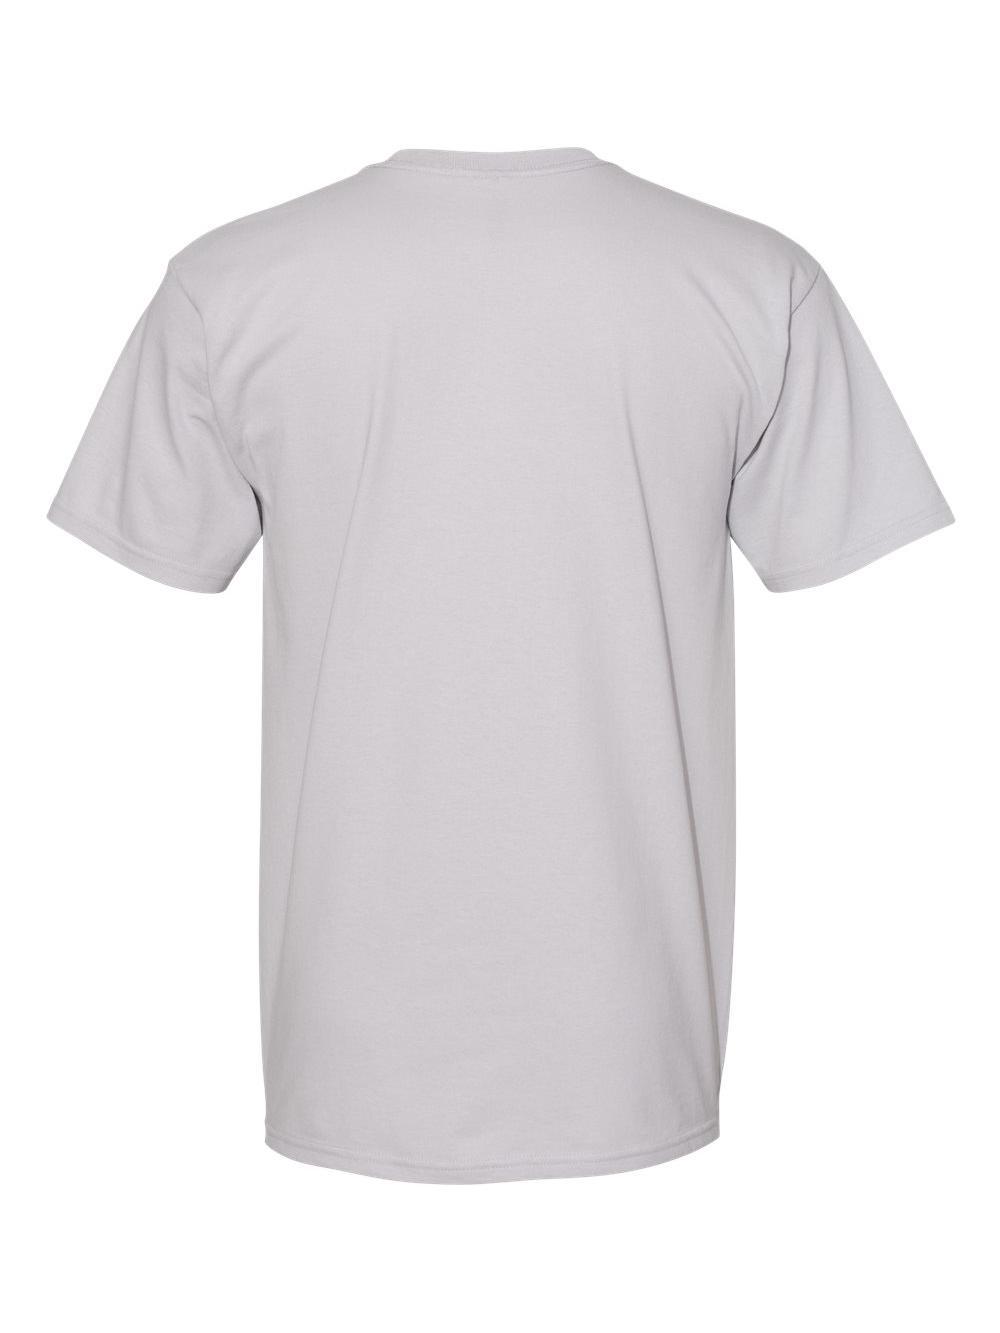 ALSTYLE-Premium-T-Shirt-1701 thumbnail 59